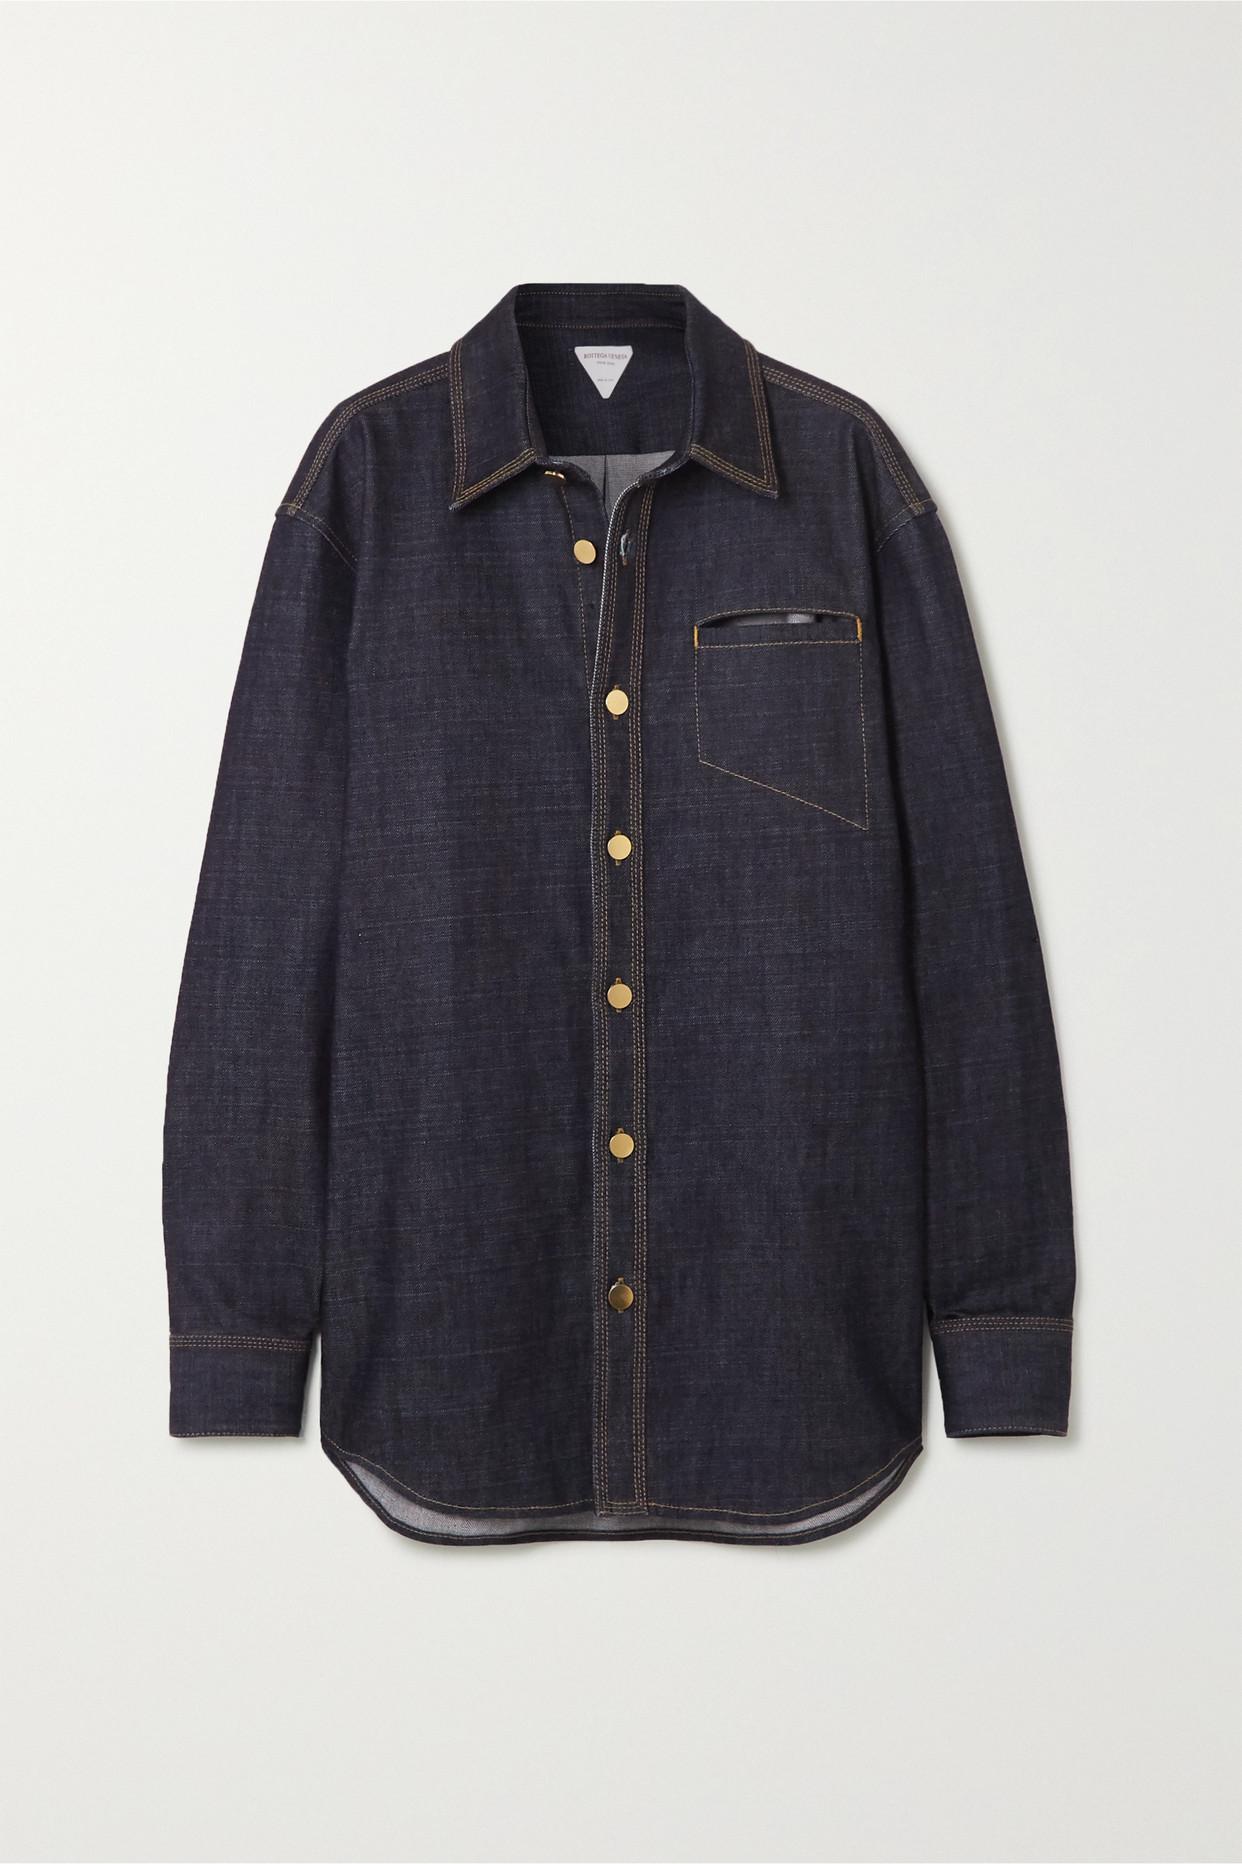 BOTTEGA VENETA - Cutout Denim Shirt - Blue - IT36